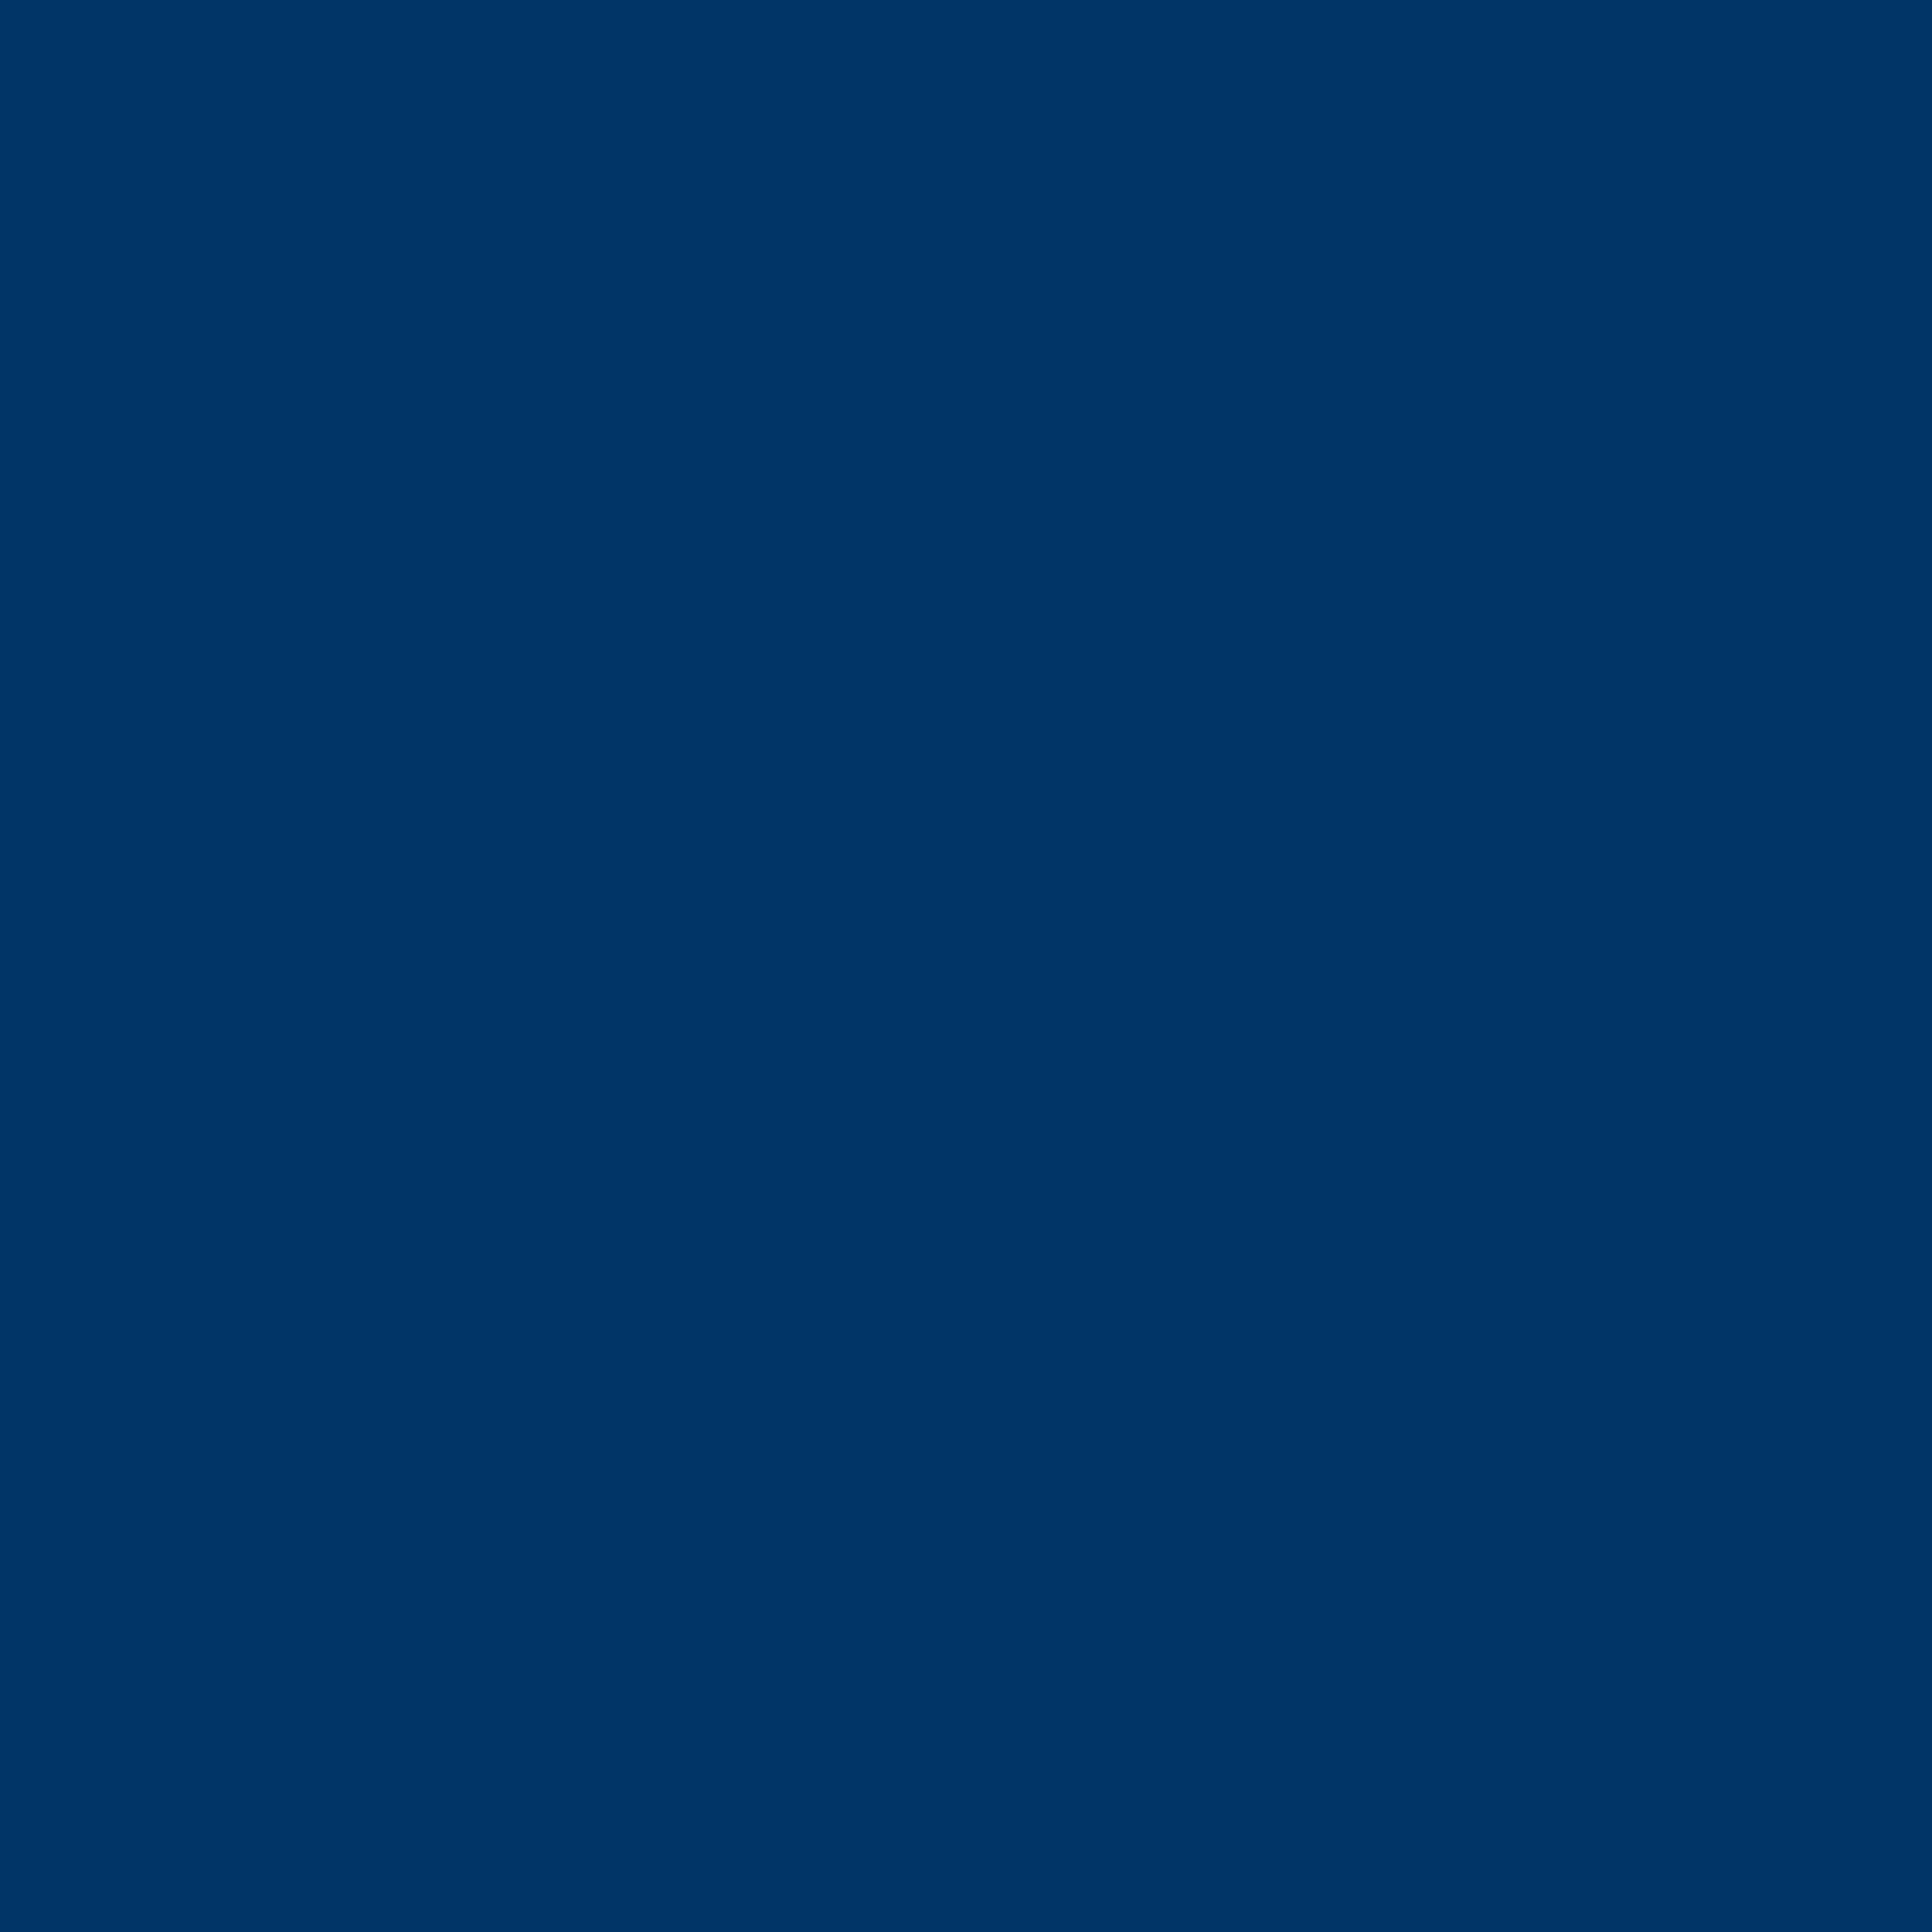 3600x3600 Dark Midnight Blue Solid Color Background